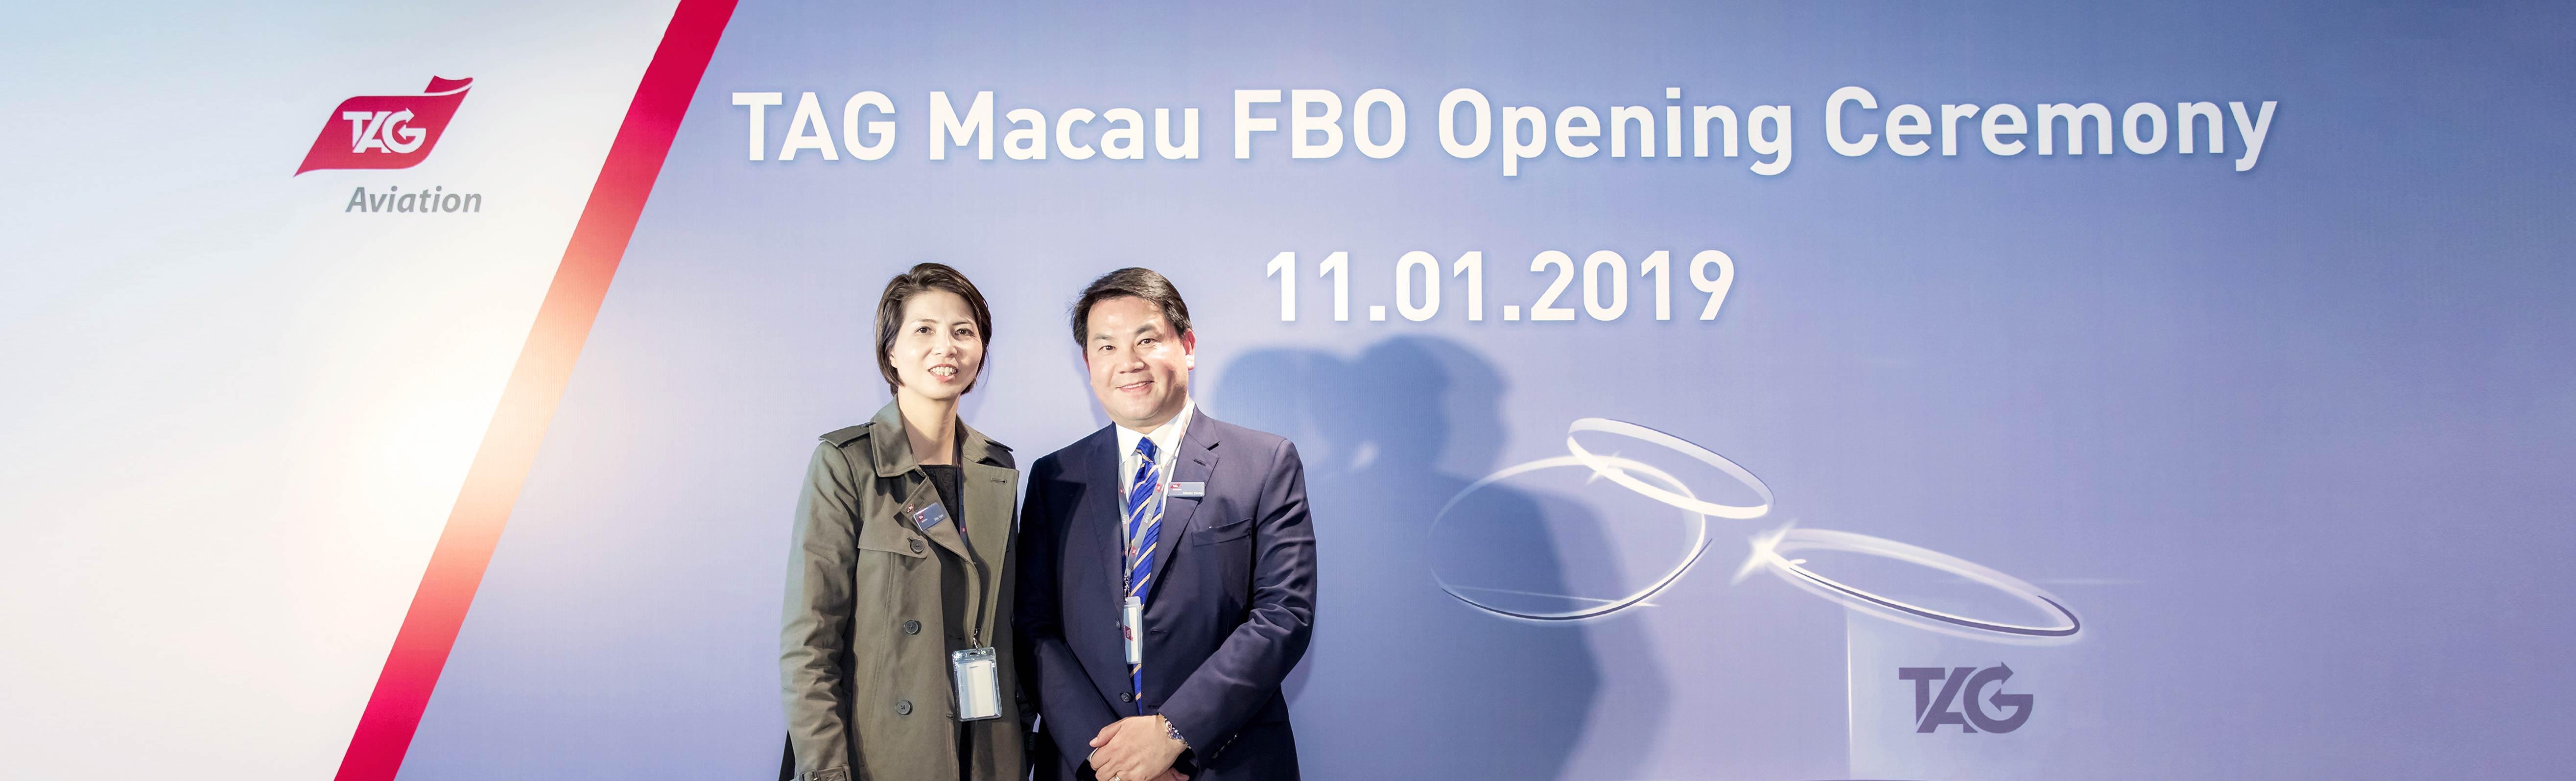 TAG Aviation opens Fixed Base Operation (FBO) in Macau